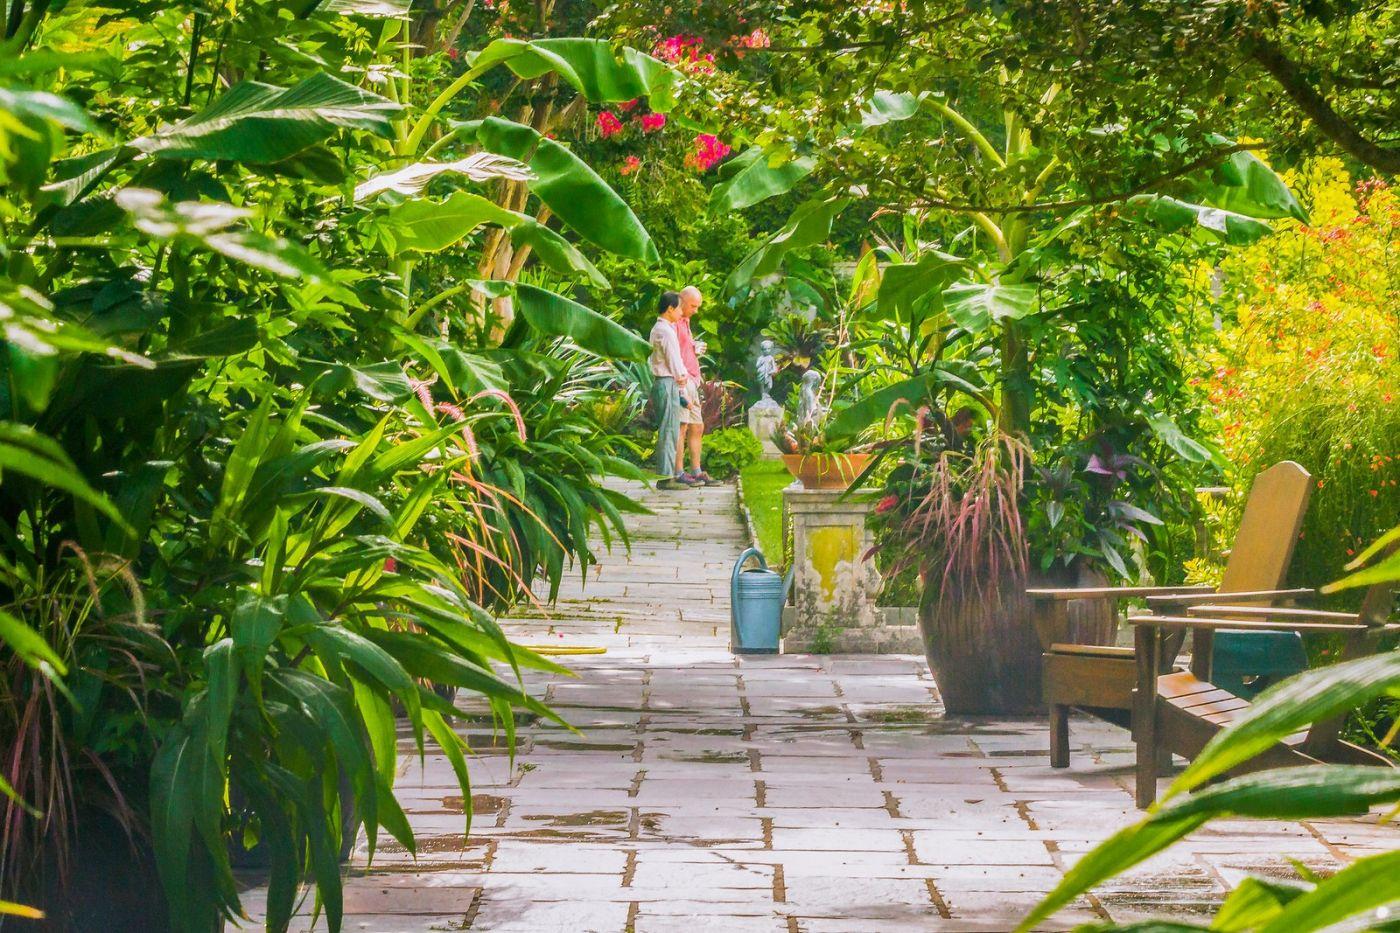 Chanticleer花园,春风得意_图1-13